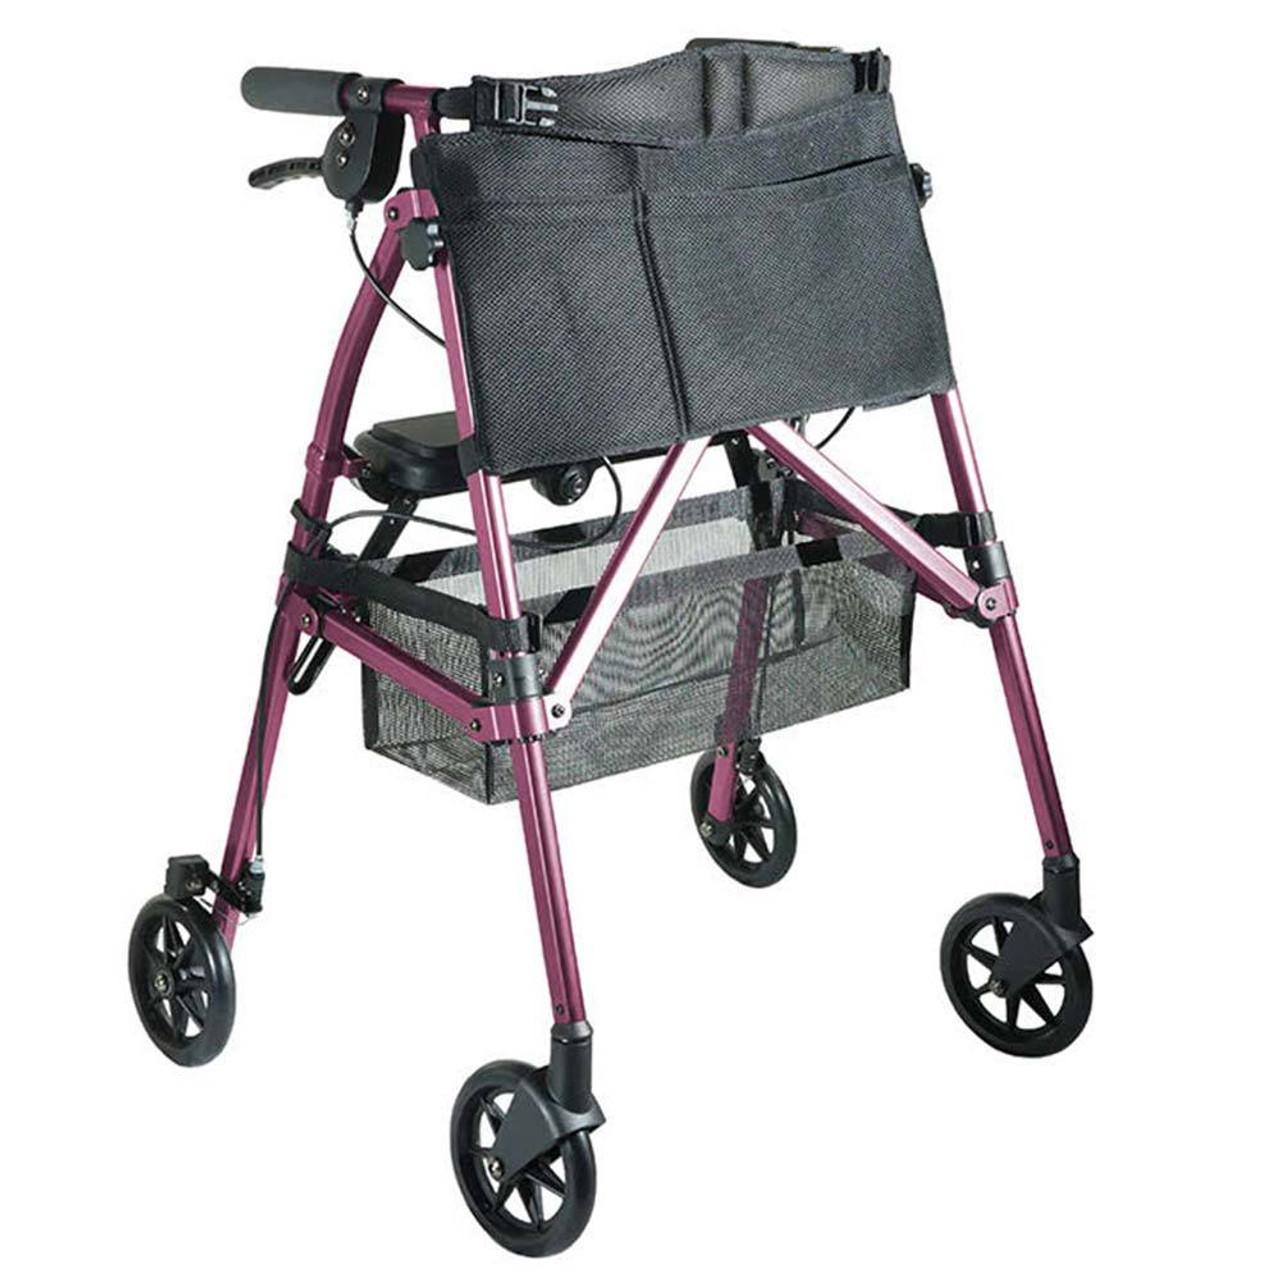 Portable Folding Mobility Walker MWPFL1